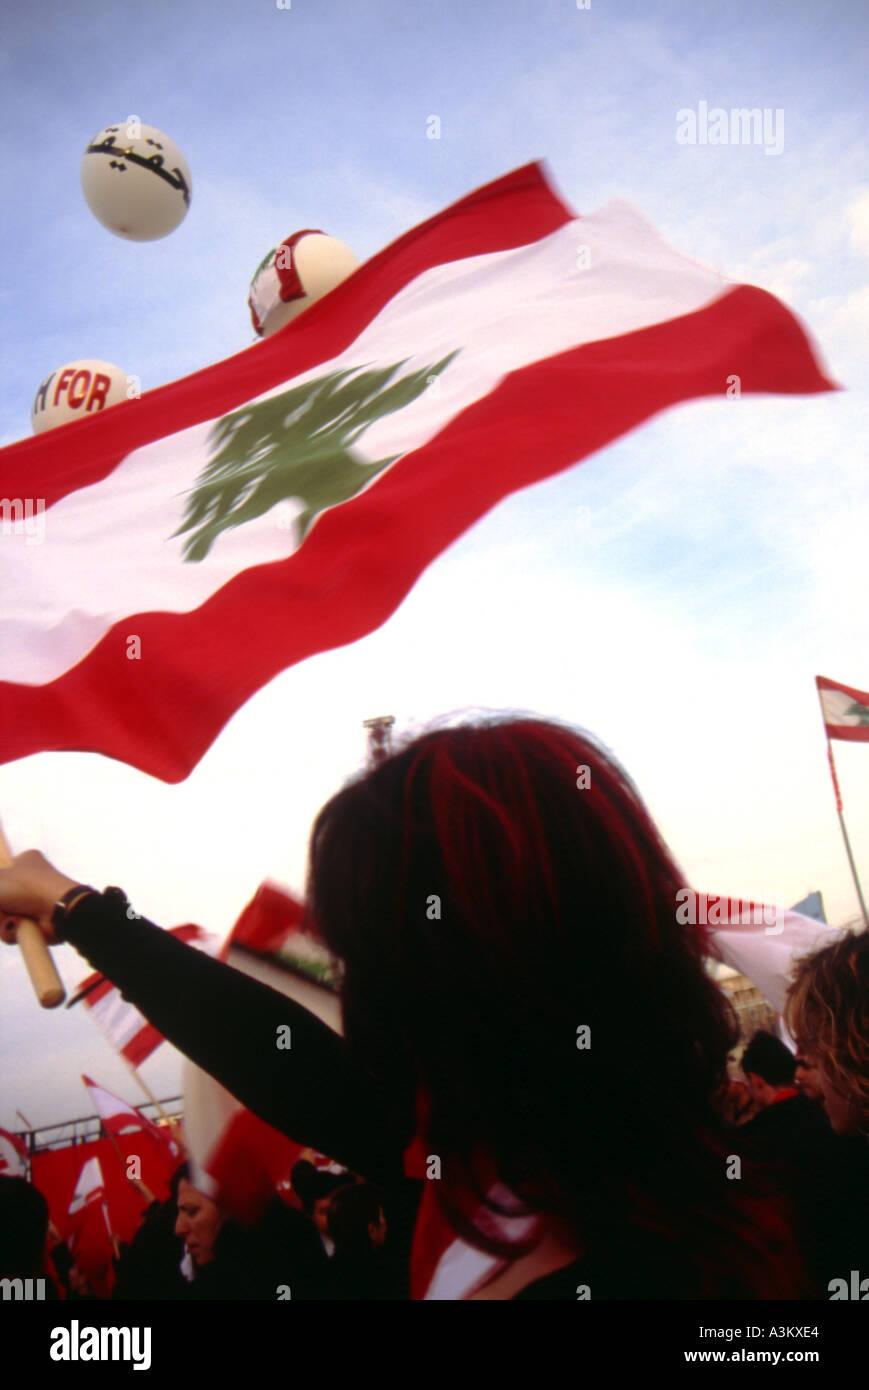 great pleasure beirut lebanon Stock Photo